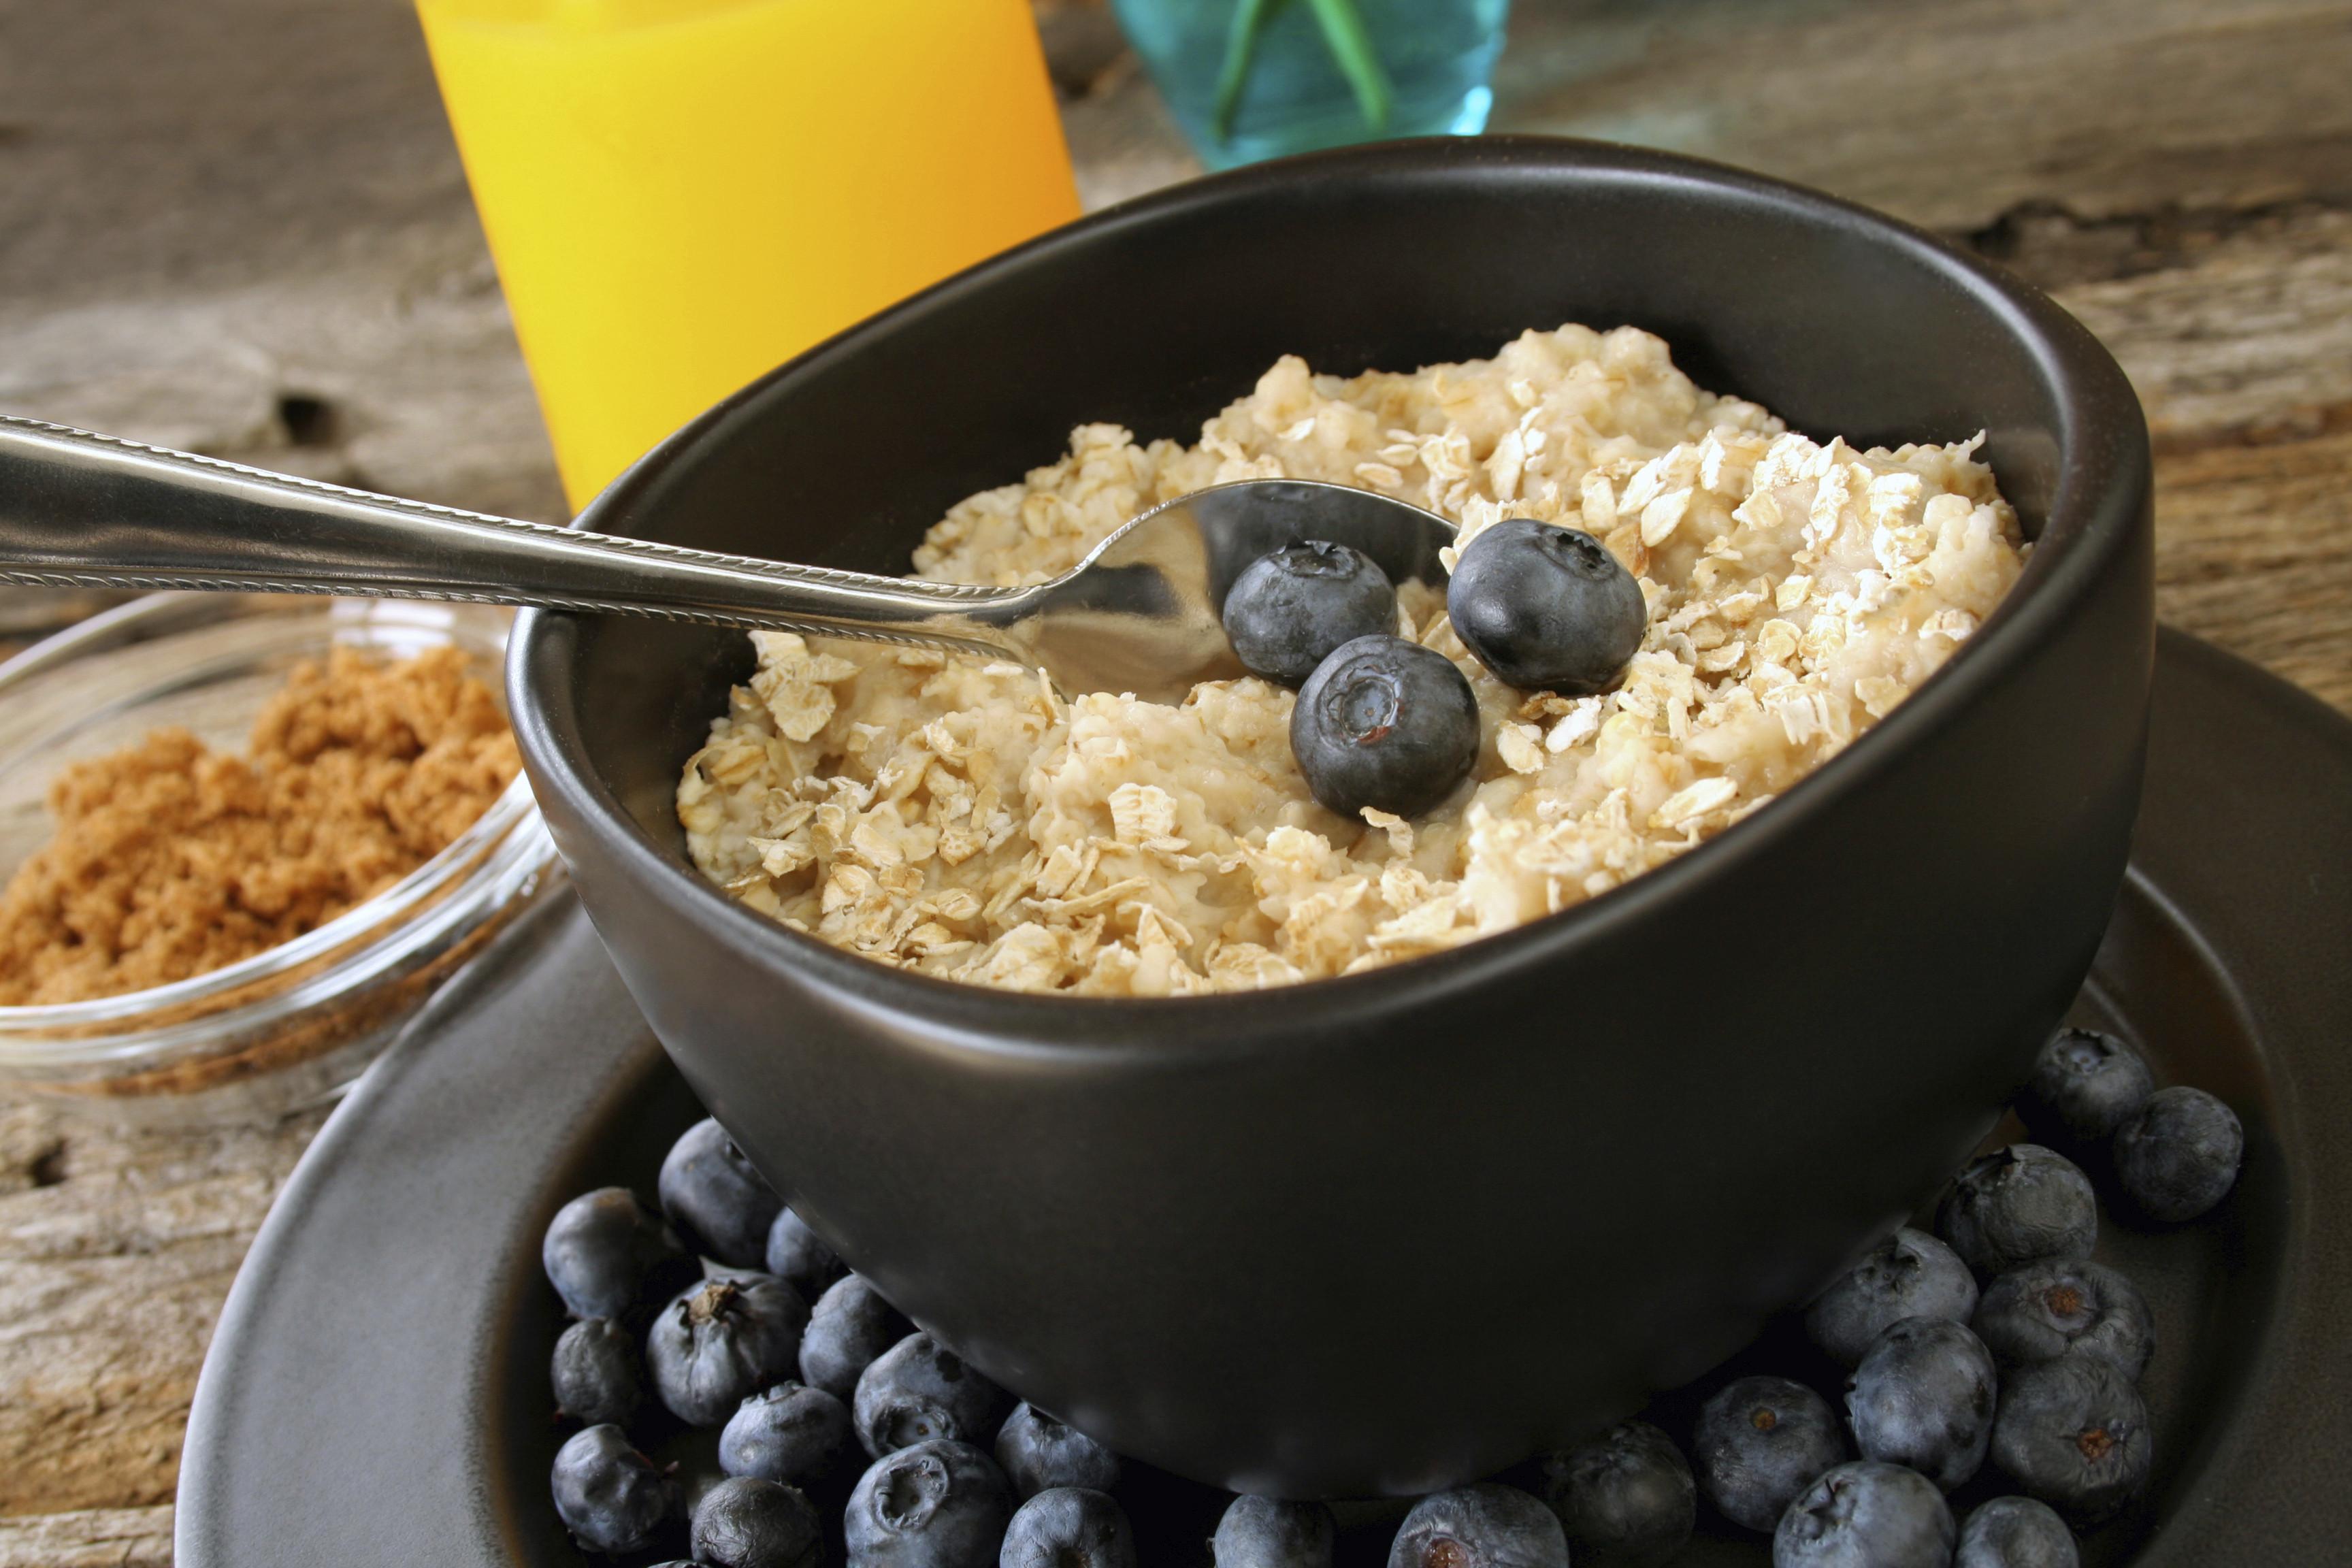 Oatmeal Healthy Breakfast  Top Strategies to Get Kids to Eat Oatmeal